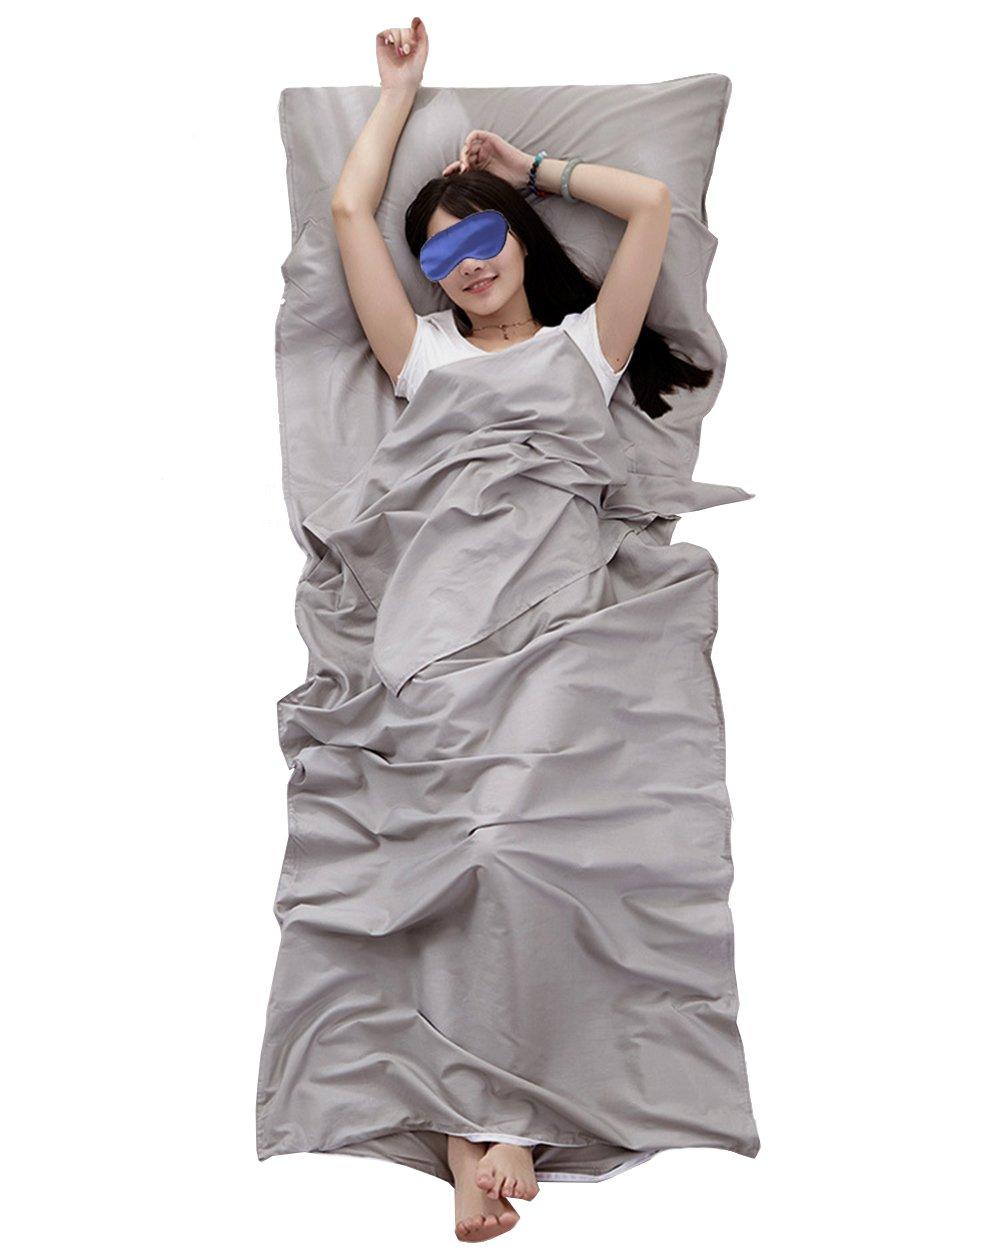 Share Maison 100% Cotton Sleeping Bag Liner Travel Sheet Camping Sleep Sheet Single/Double (Grey, 87''x47'') by Share Maison